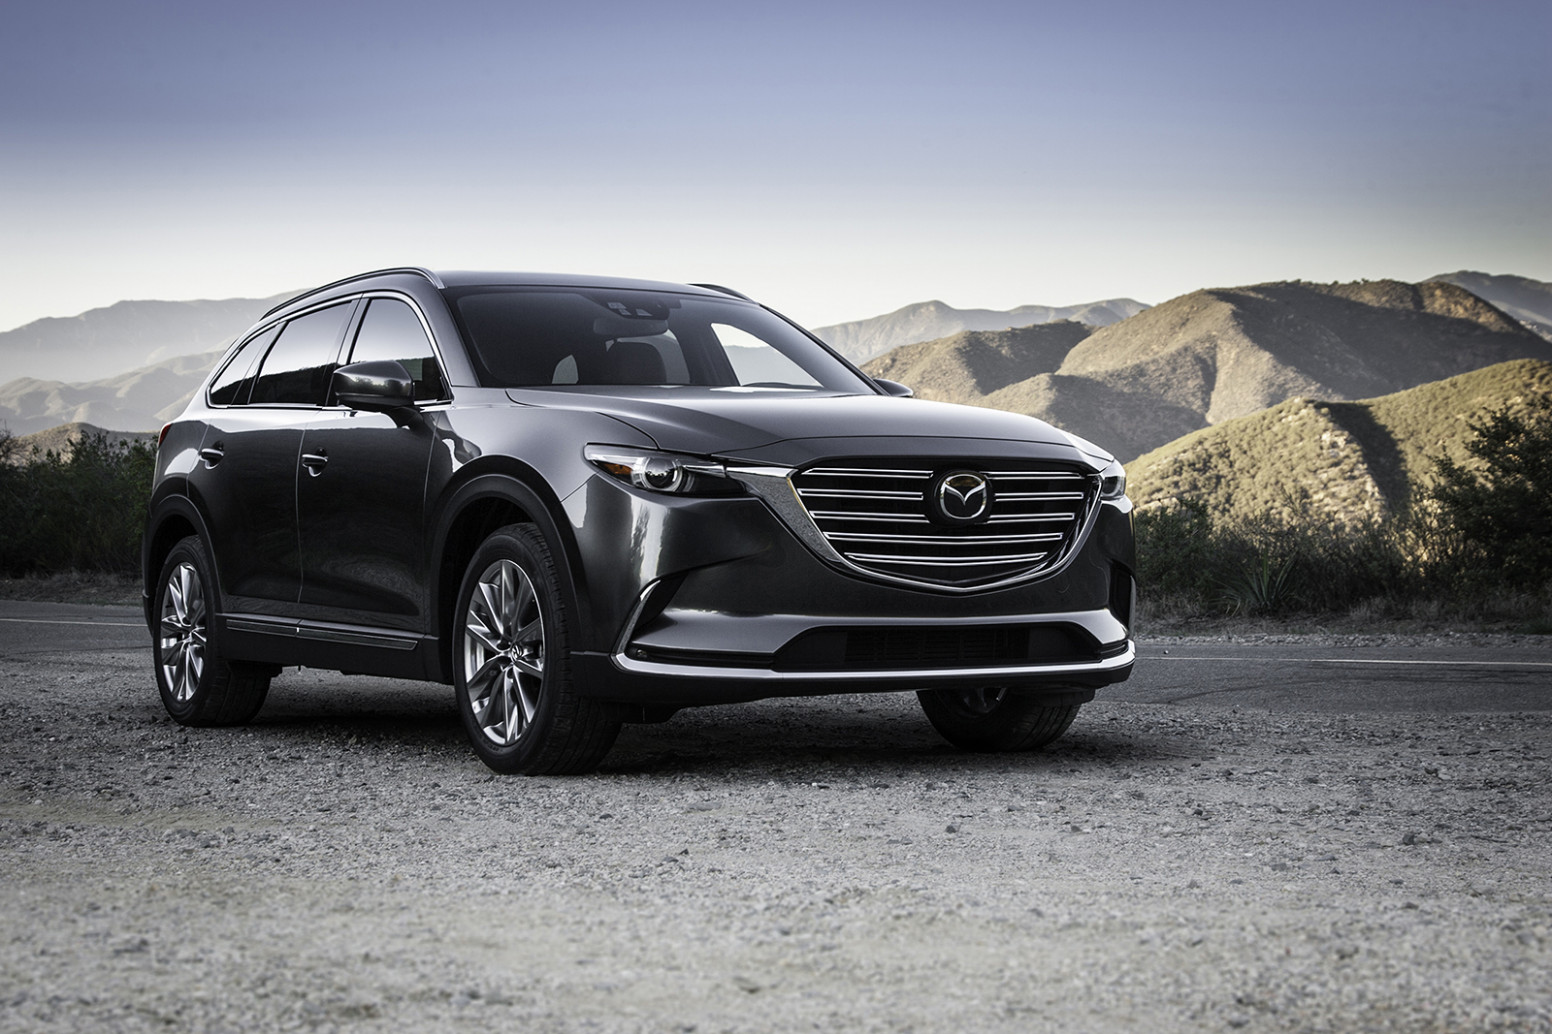 Spesification 2022 Mazda CX-9s